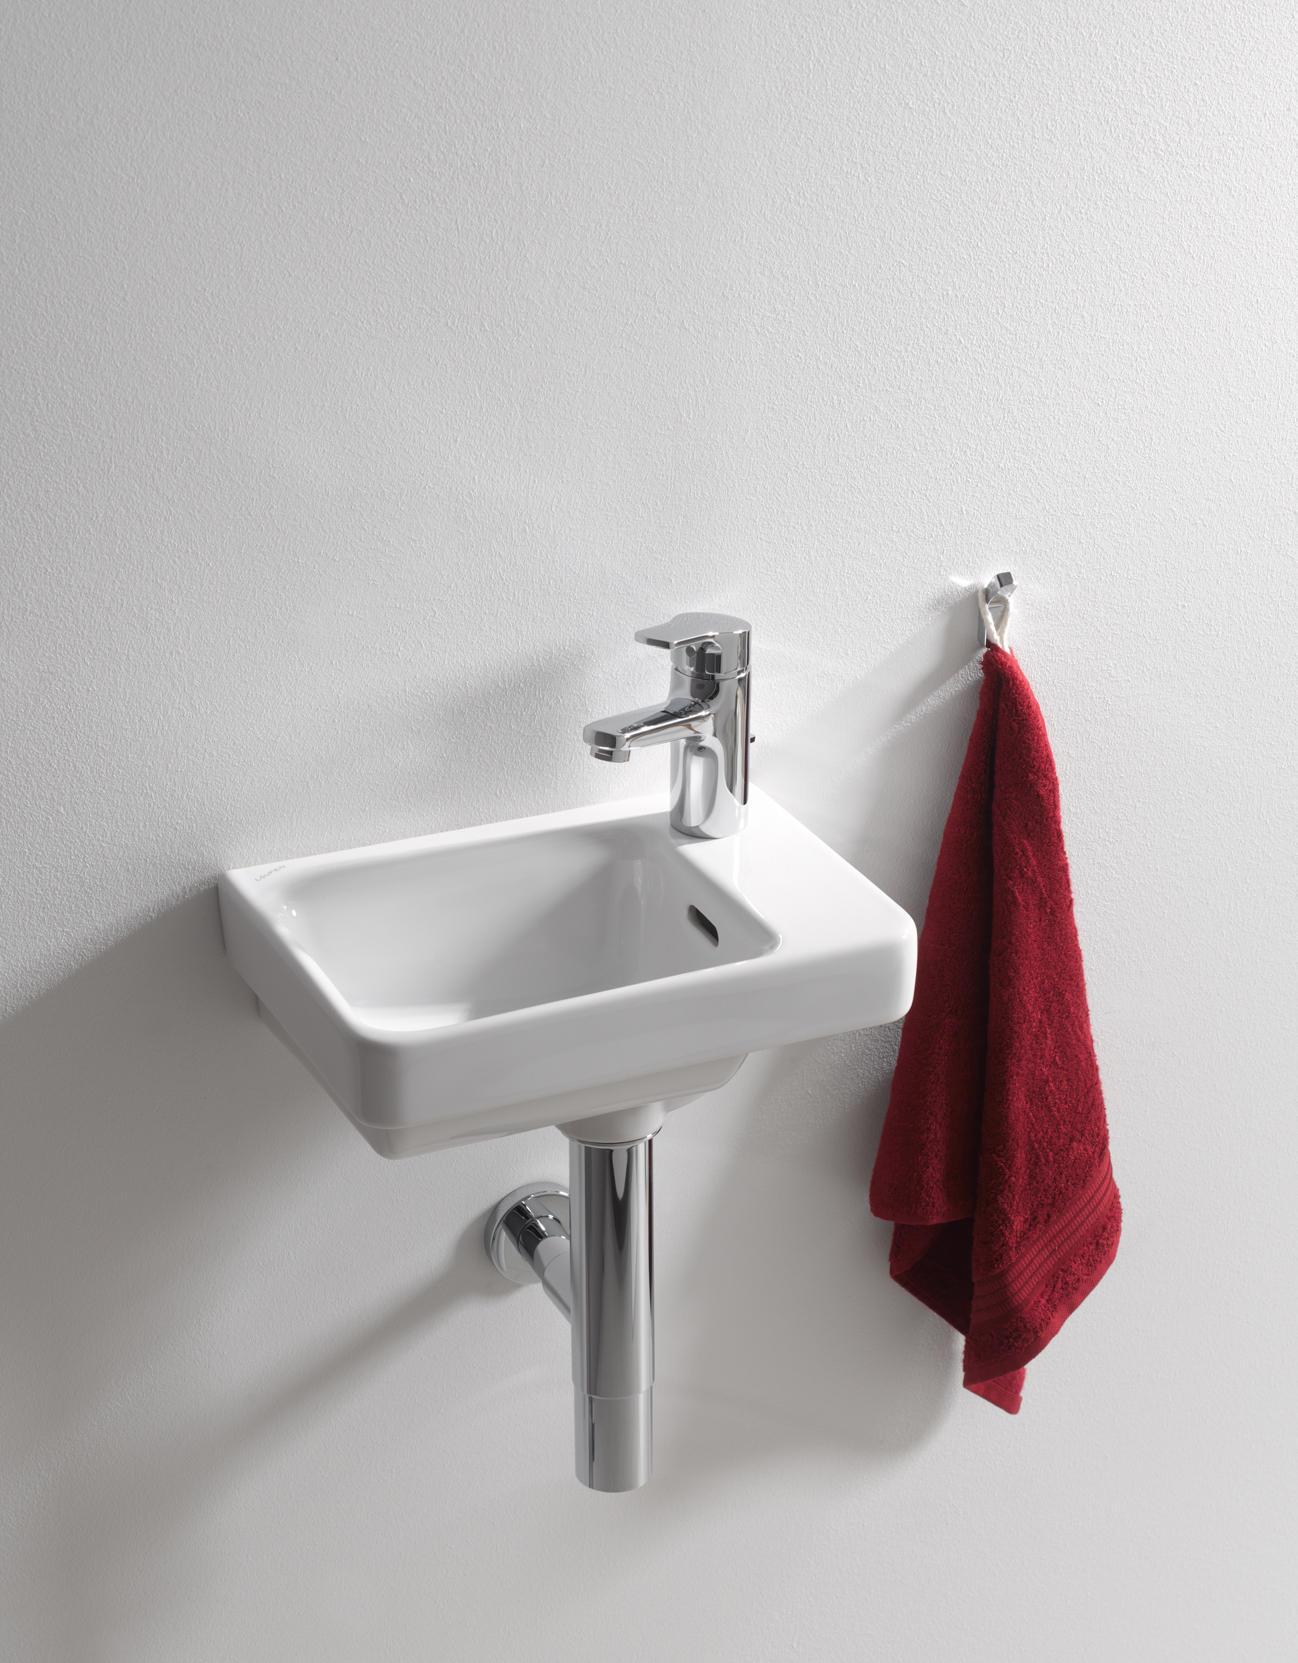 laufen pro s small washbasin asymmetric wash basins. Black Bedroom Furniture Sets. Home Design Ideas